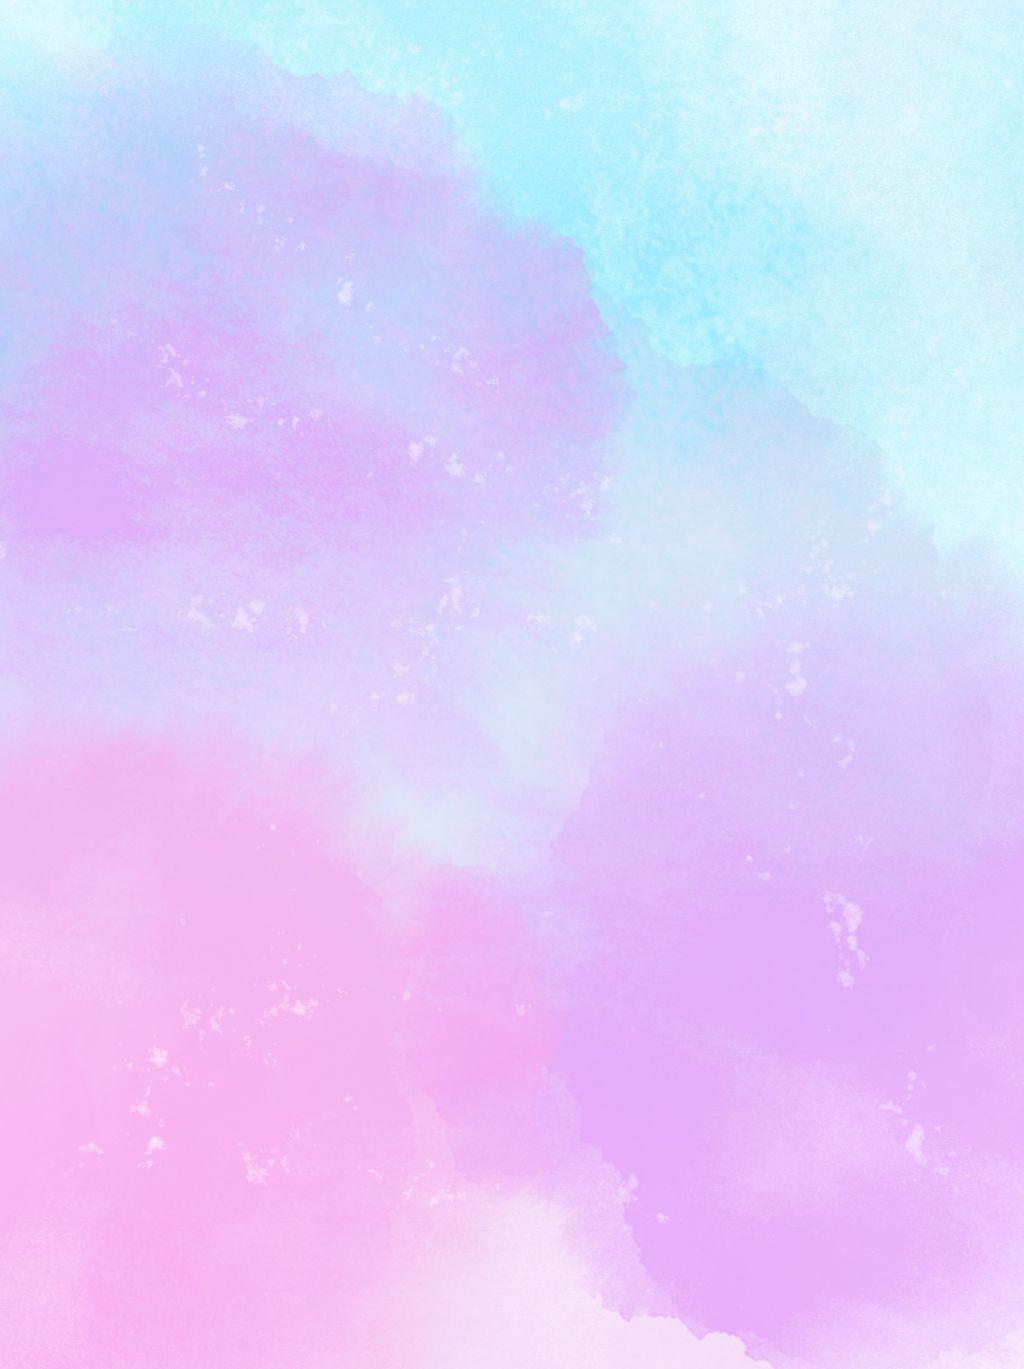 Pink Purple Blue Watercolor Background Latar Belakang Ungu Gambar Hiasan